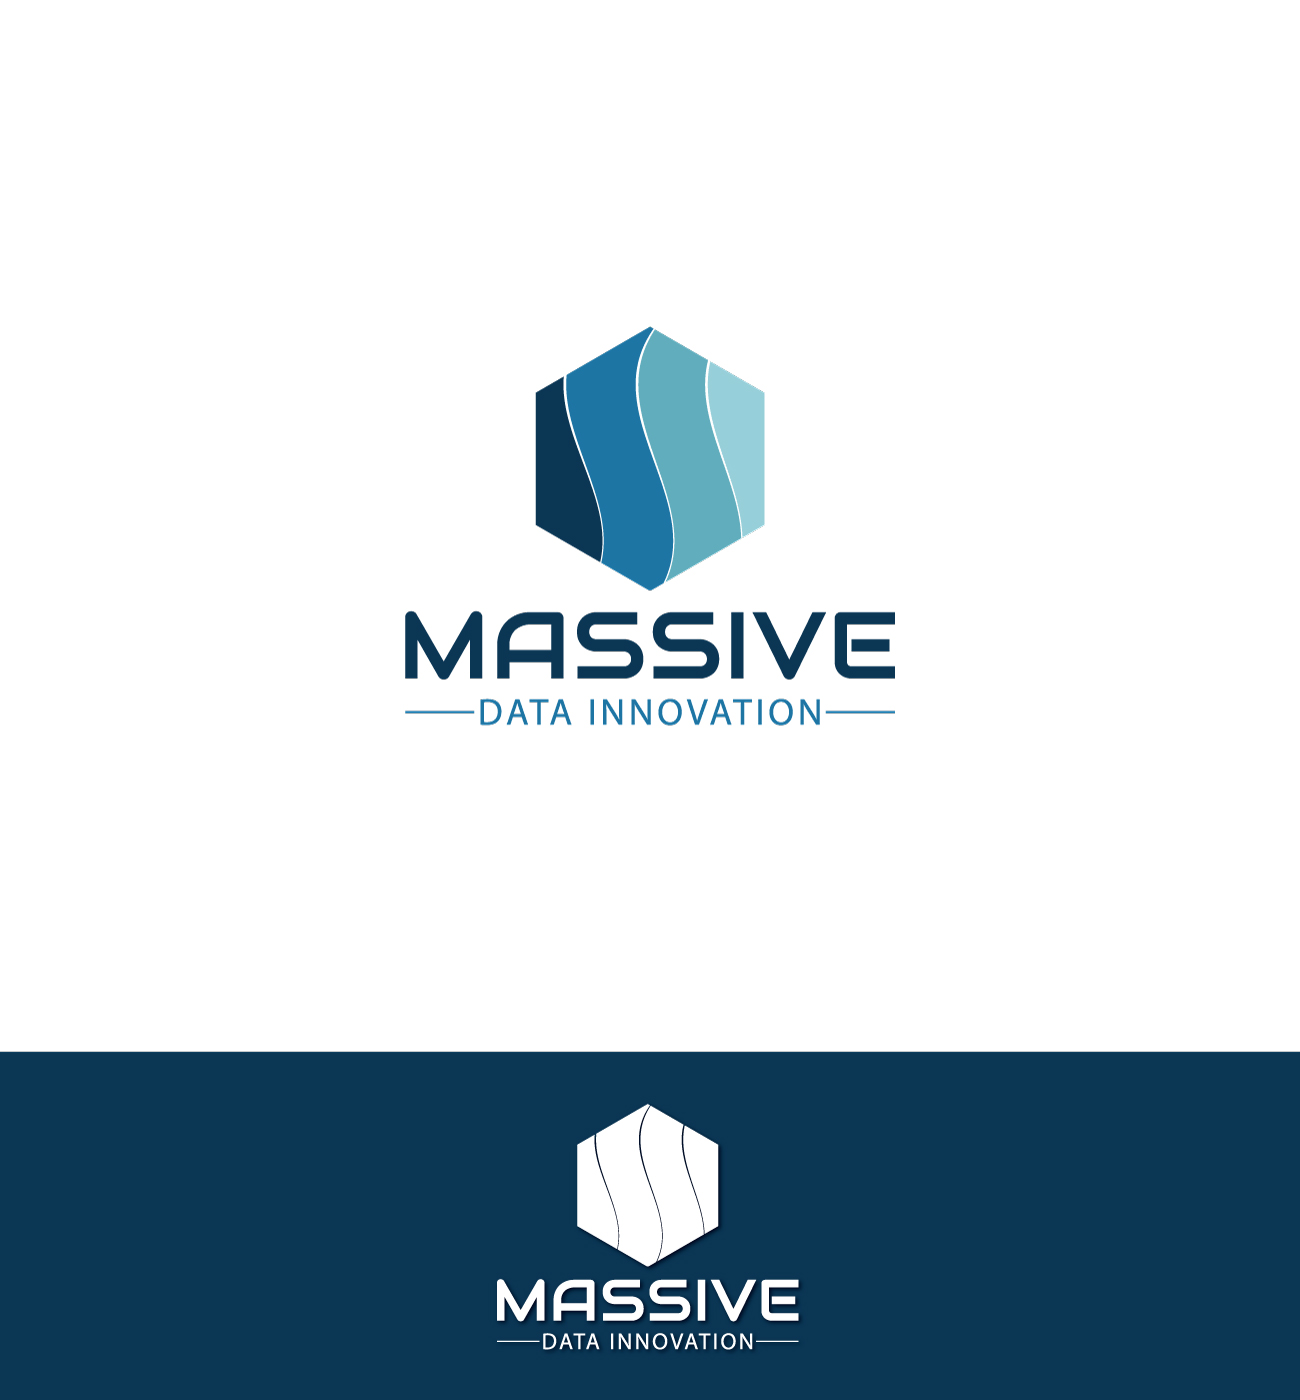 Logo Design by Sami Baig - Entry No. 441 in the Logo Design Contest MASSIVE LOGO.